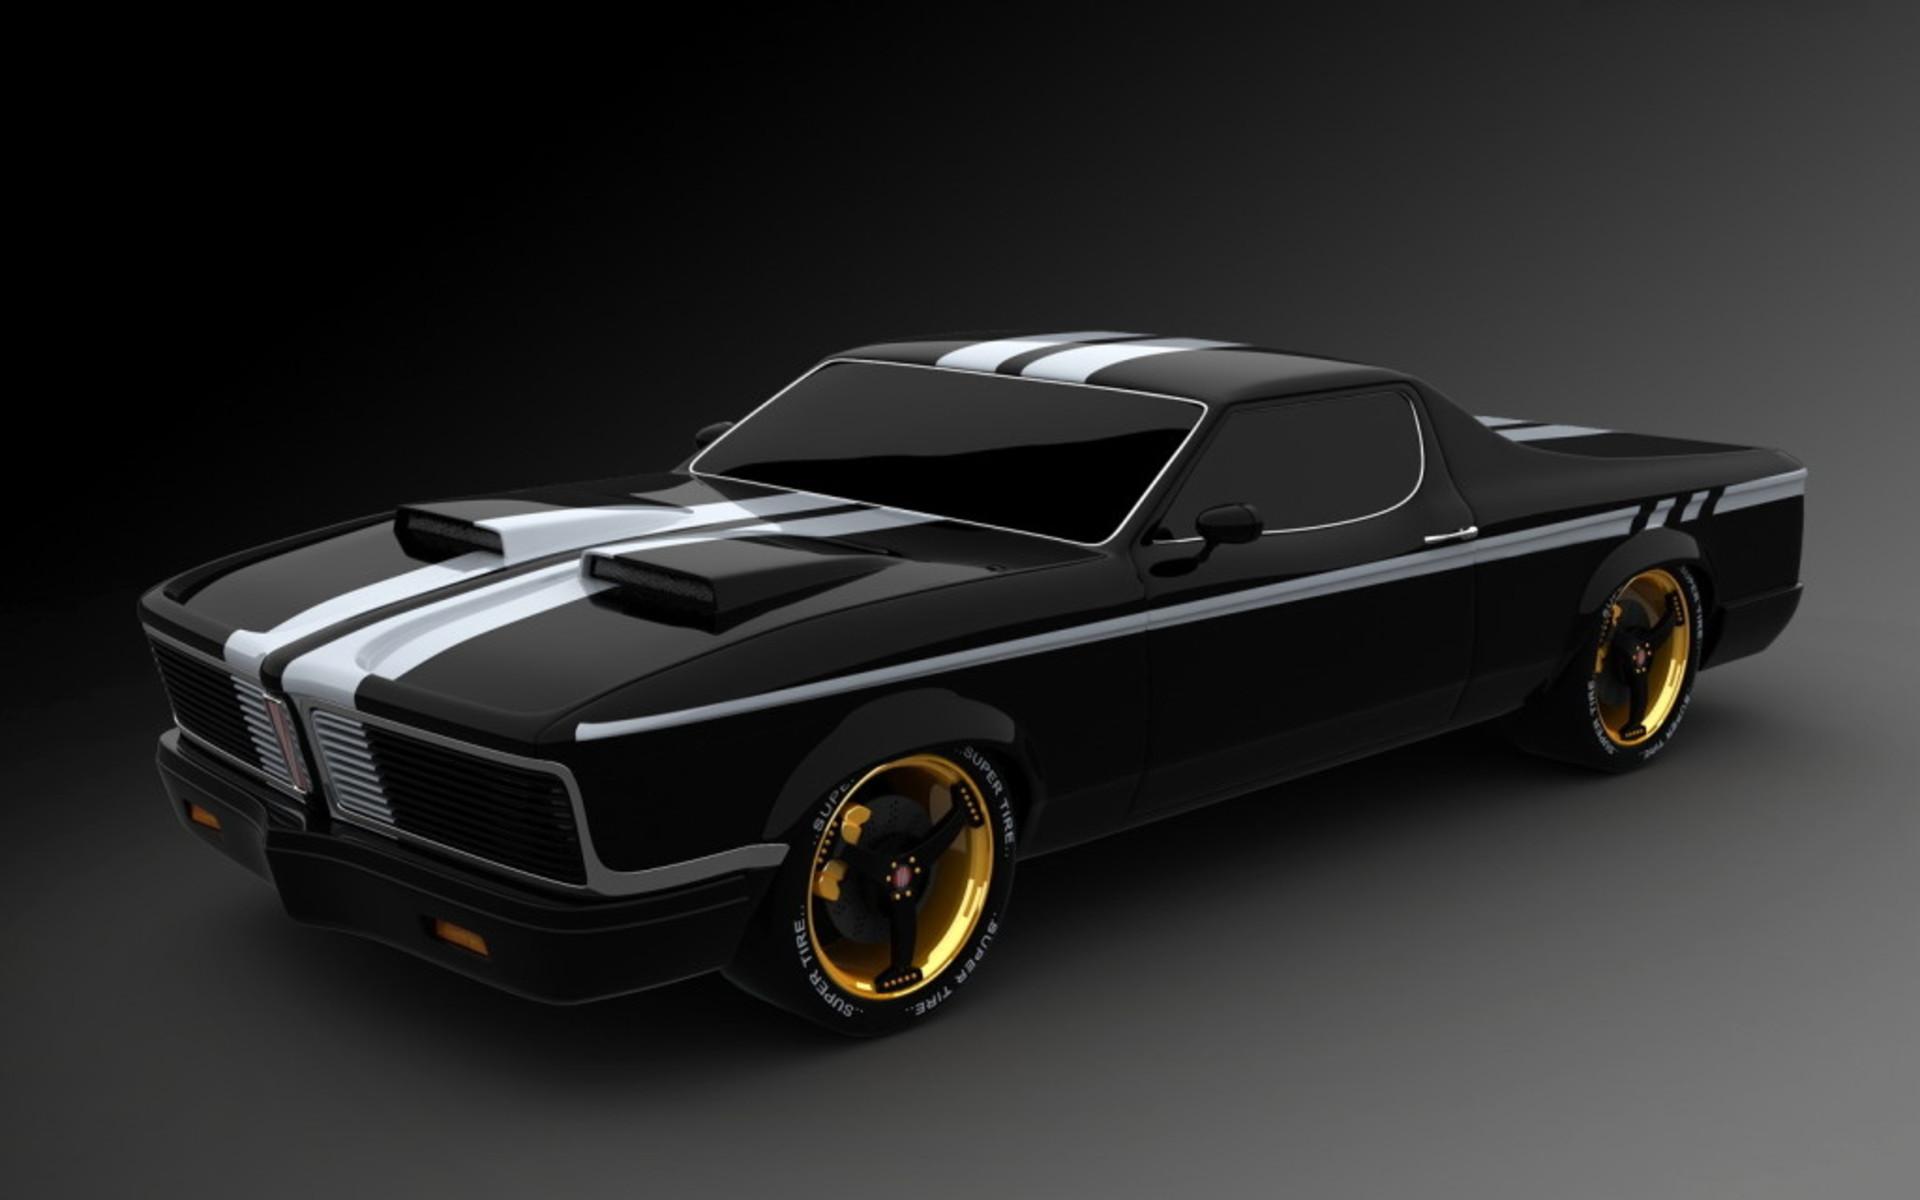 Awesome pontiac gto classic muscle car 1280x800